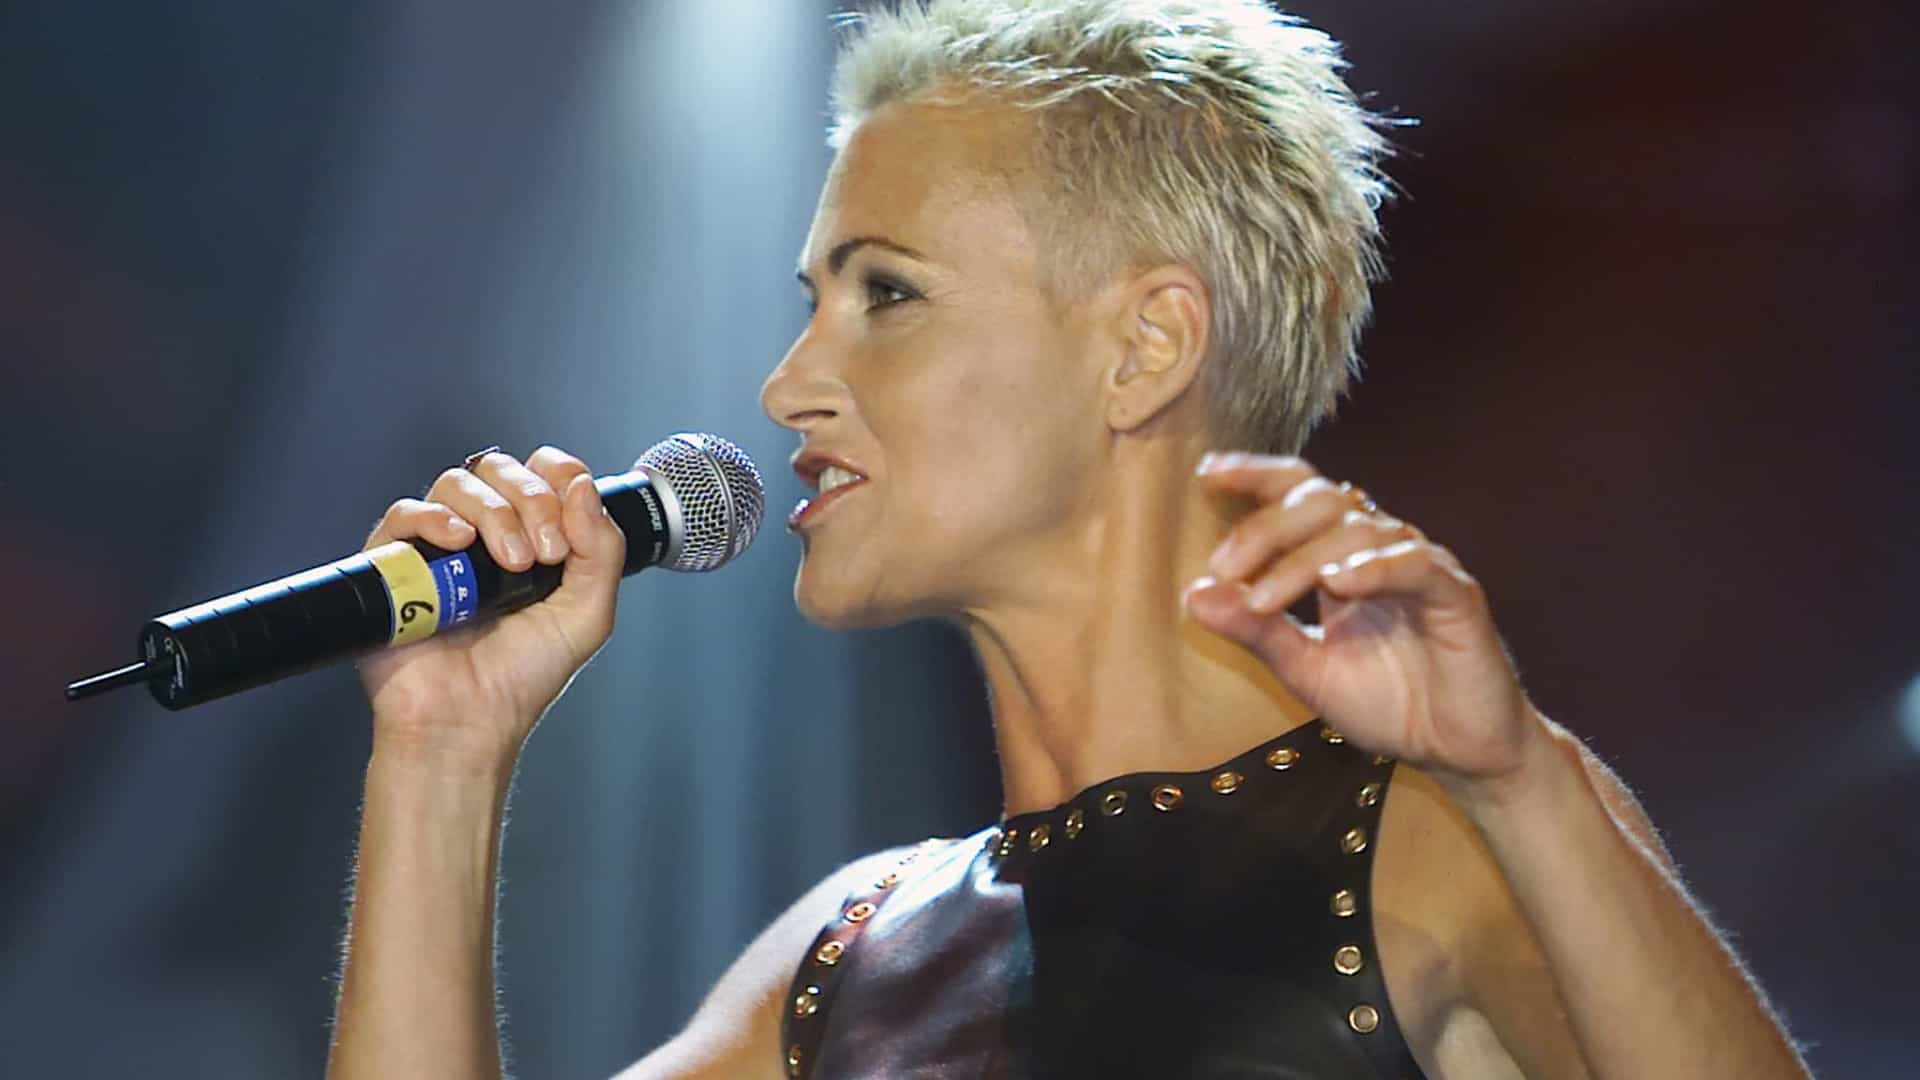 ÚLTIMA HORA: Morreu Marie Fredriksson, a vocalista dos Roxette